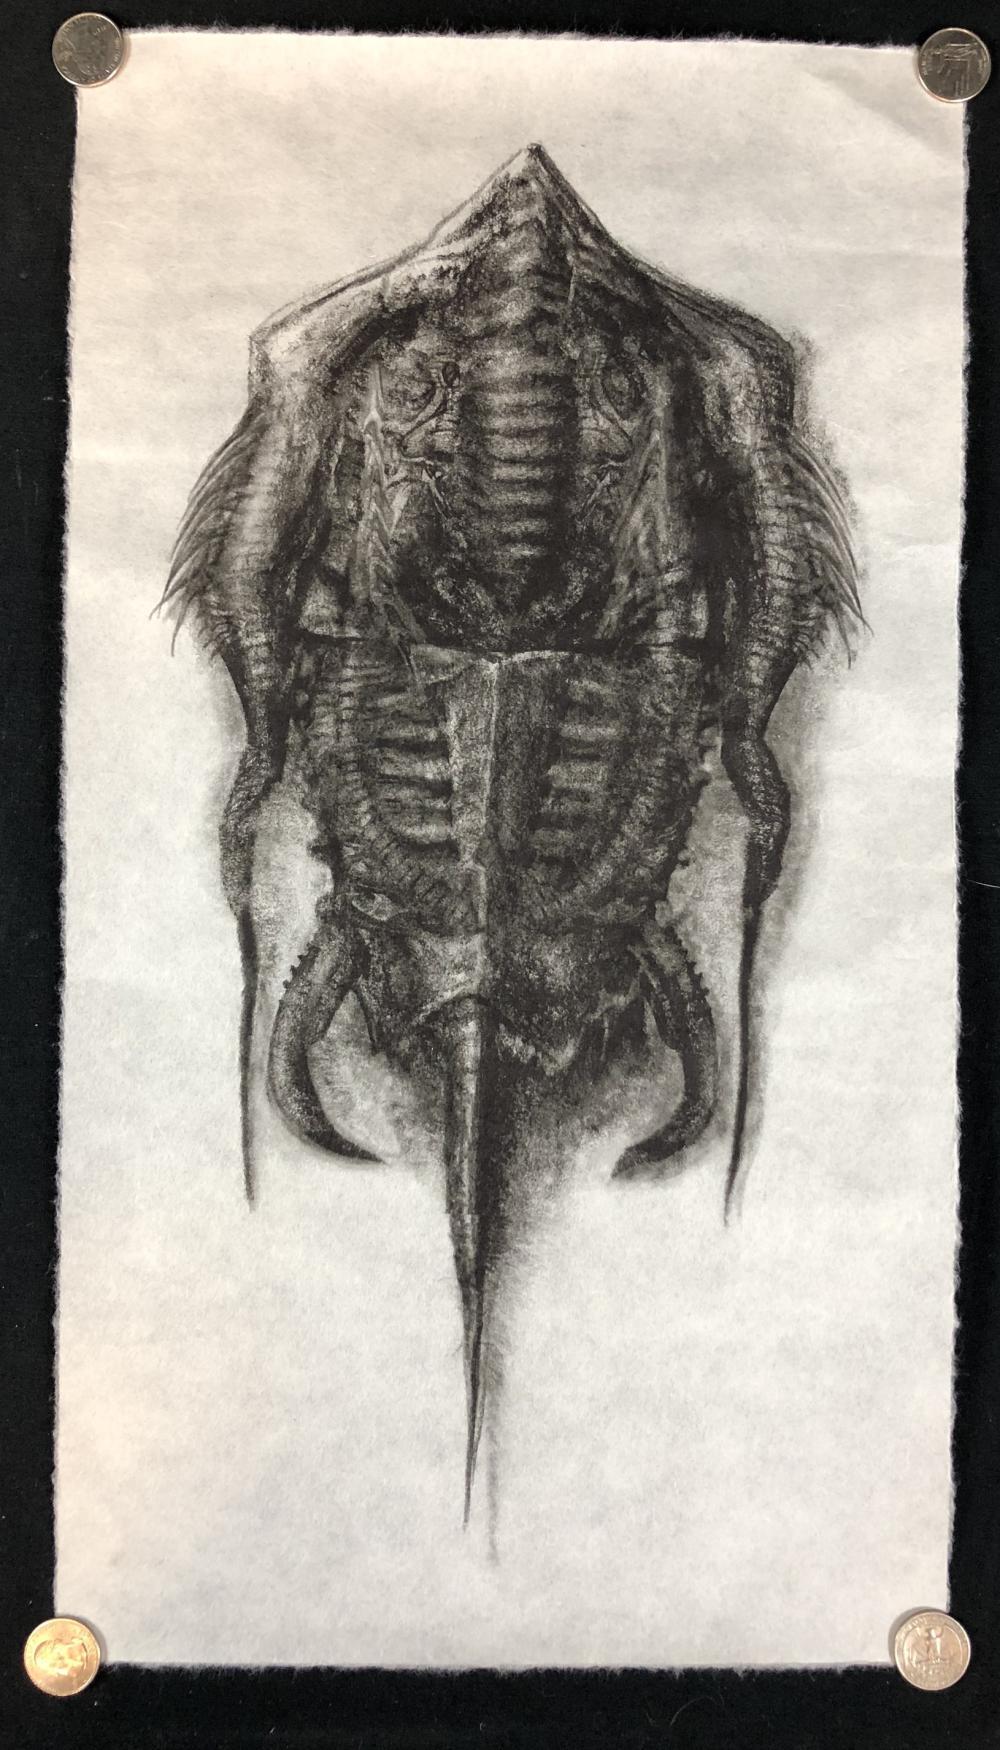 Alien: Covenant (2017) - Screen Used Artwork from David's Room (Michael Fassbender) - Lot D